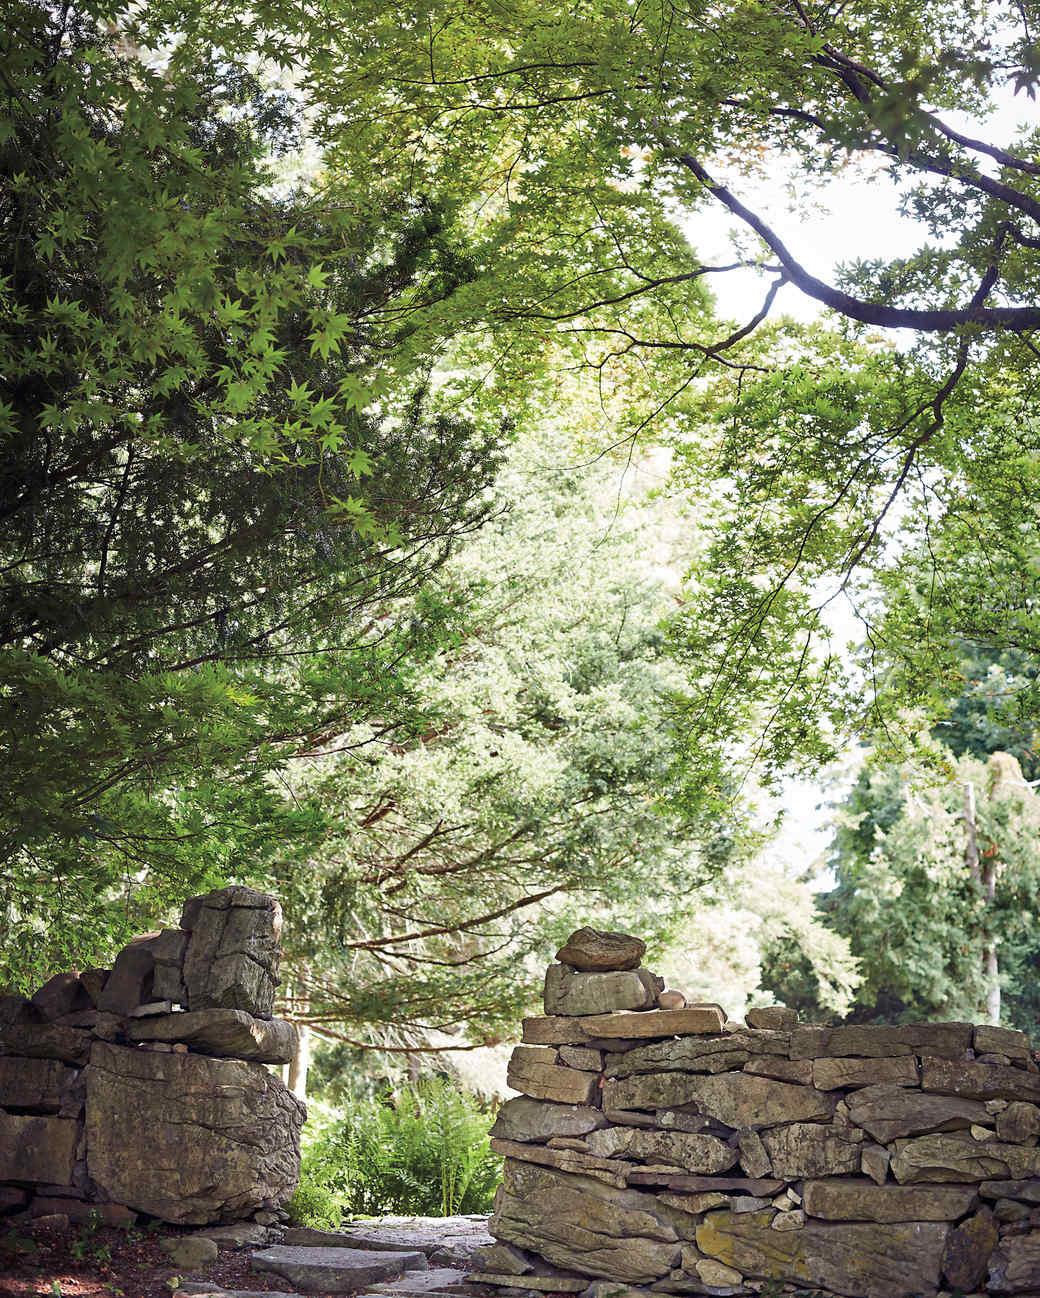 meadowburn-farm-stone-fence-179-d111449.jpg